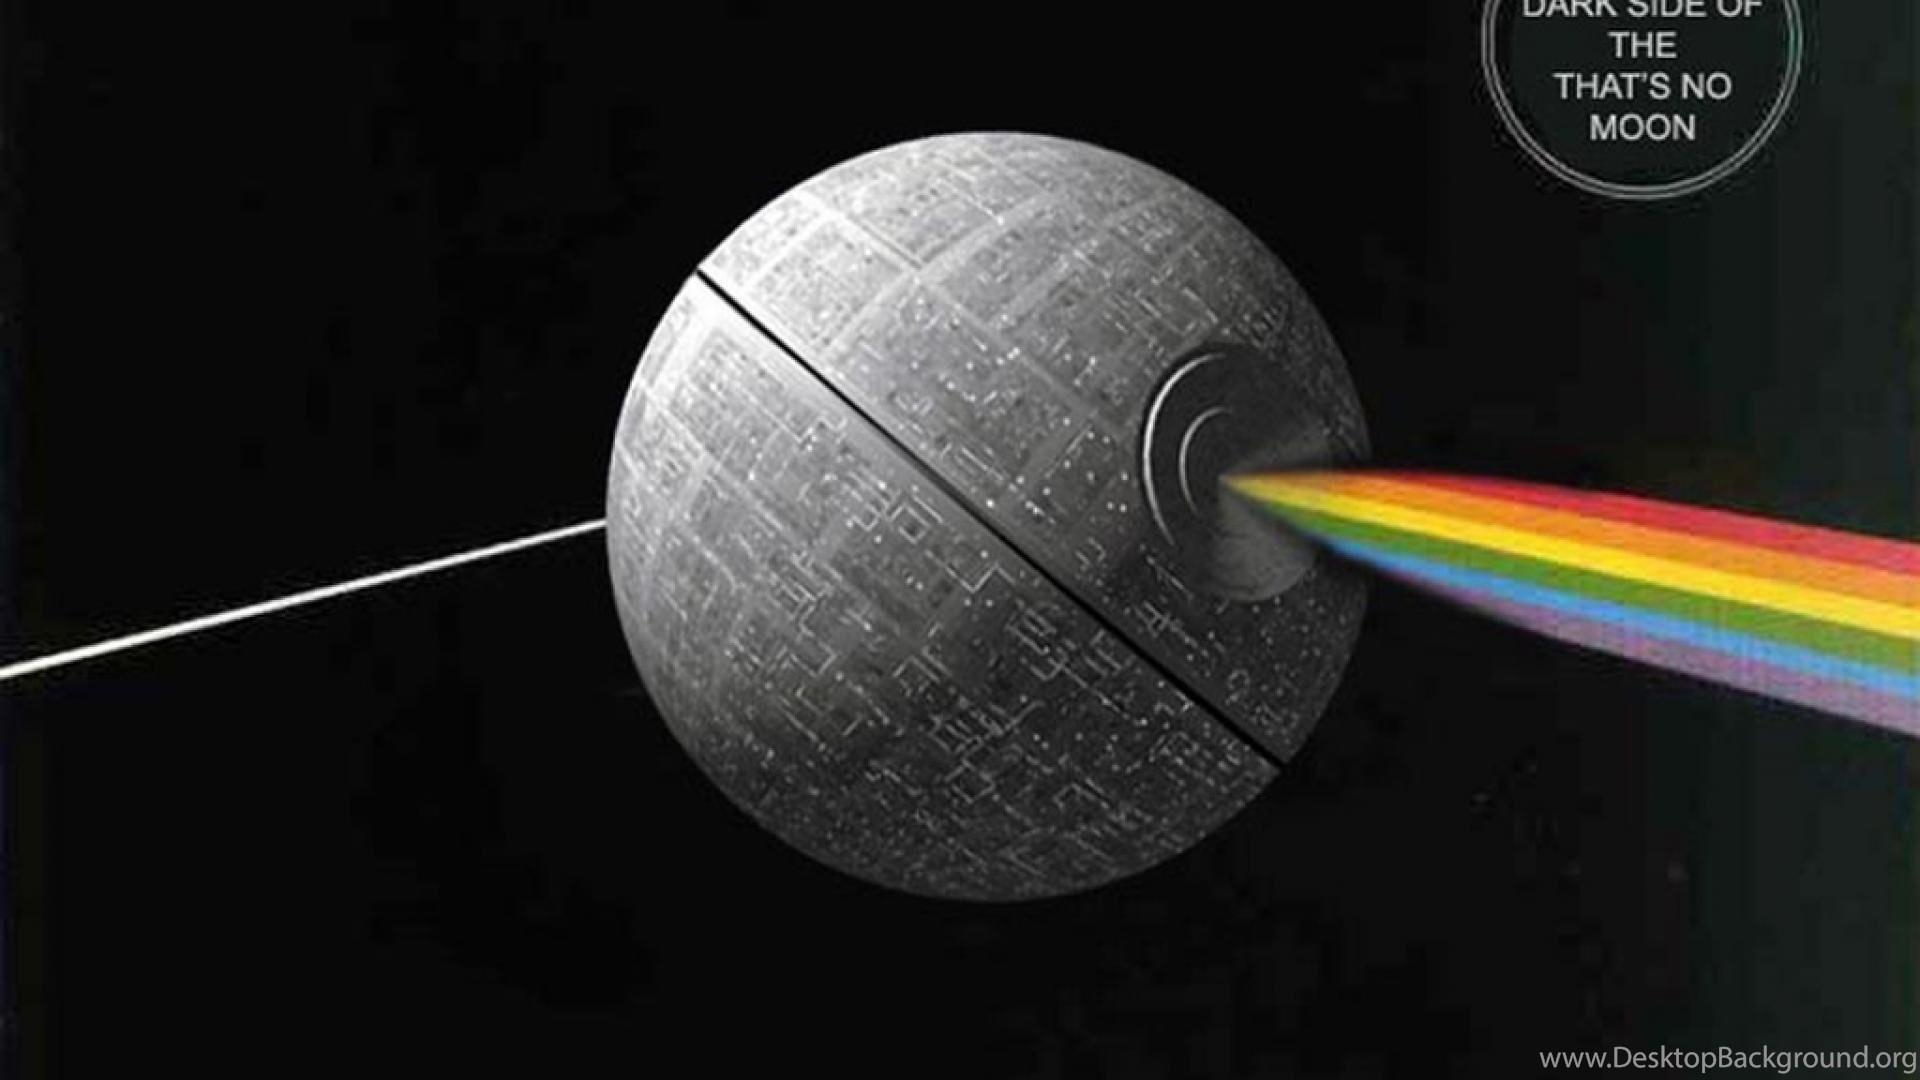 Death Star Pink Floyd Wars The Dark Side Of Moon